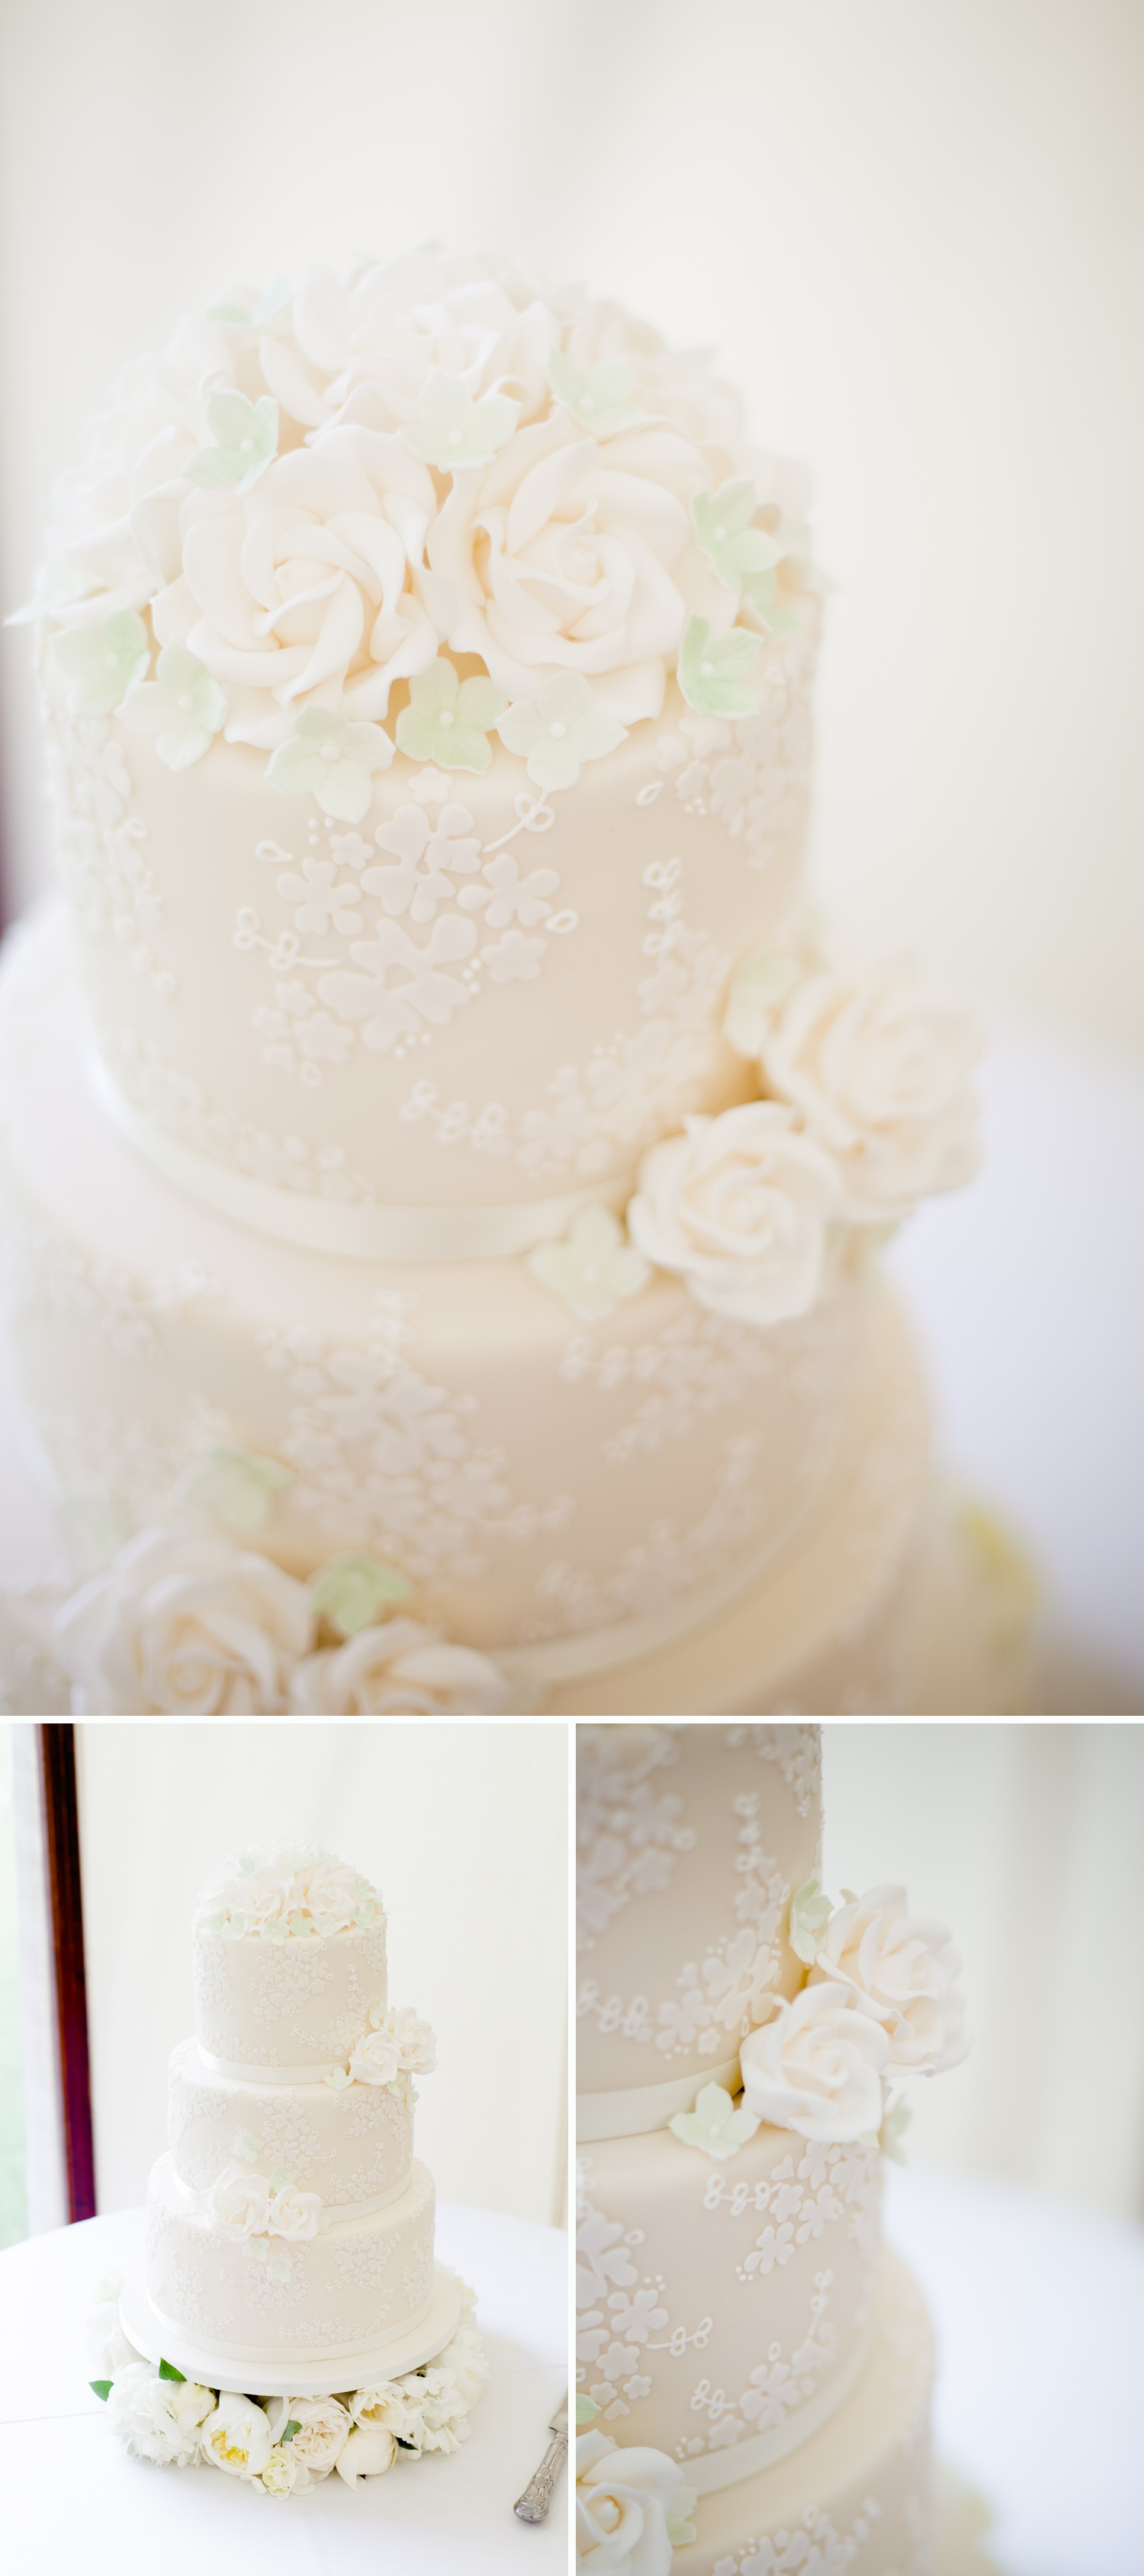 Emily & Jonathan's Cambridgeshire wedding - beautiful 3 tiered wedding cake